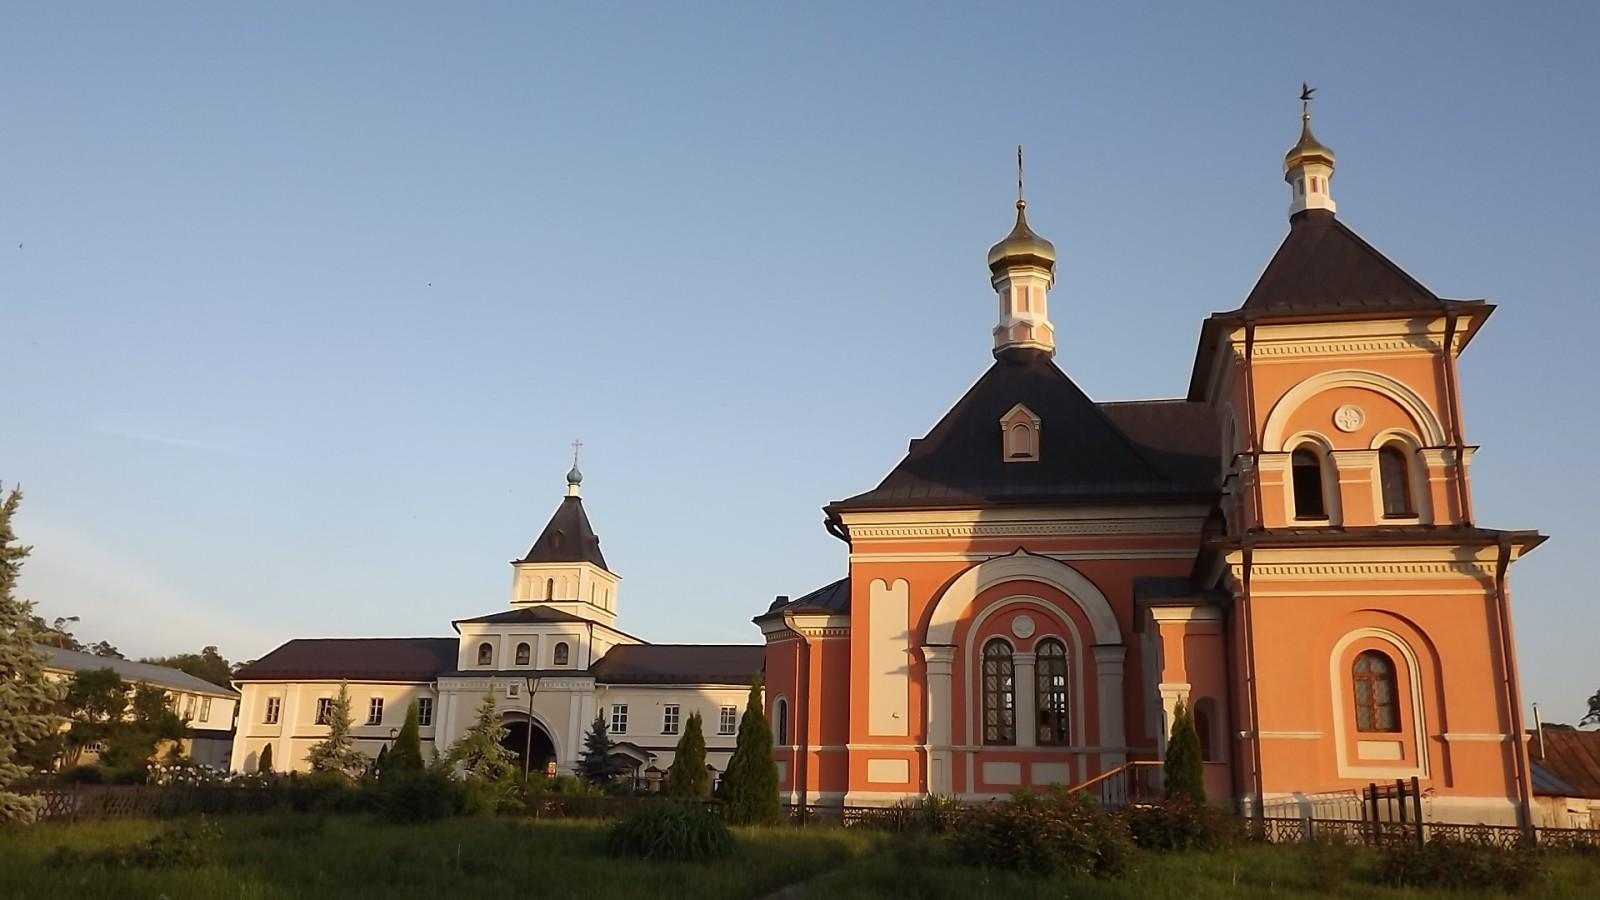 Преображенский храм и Святые врата